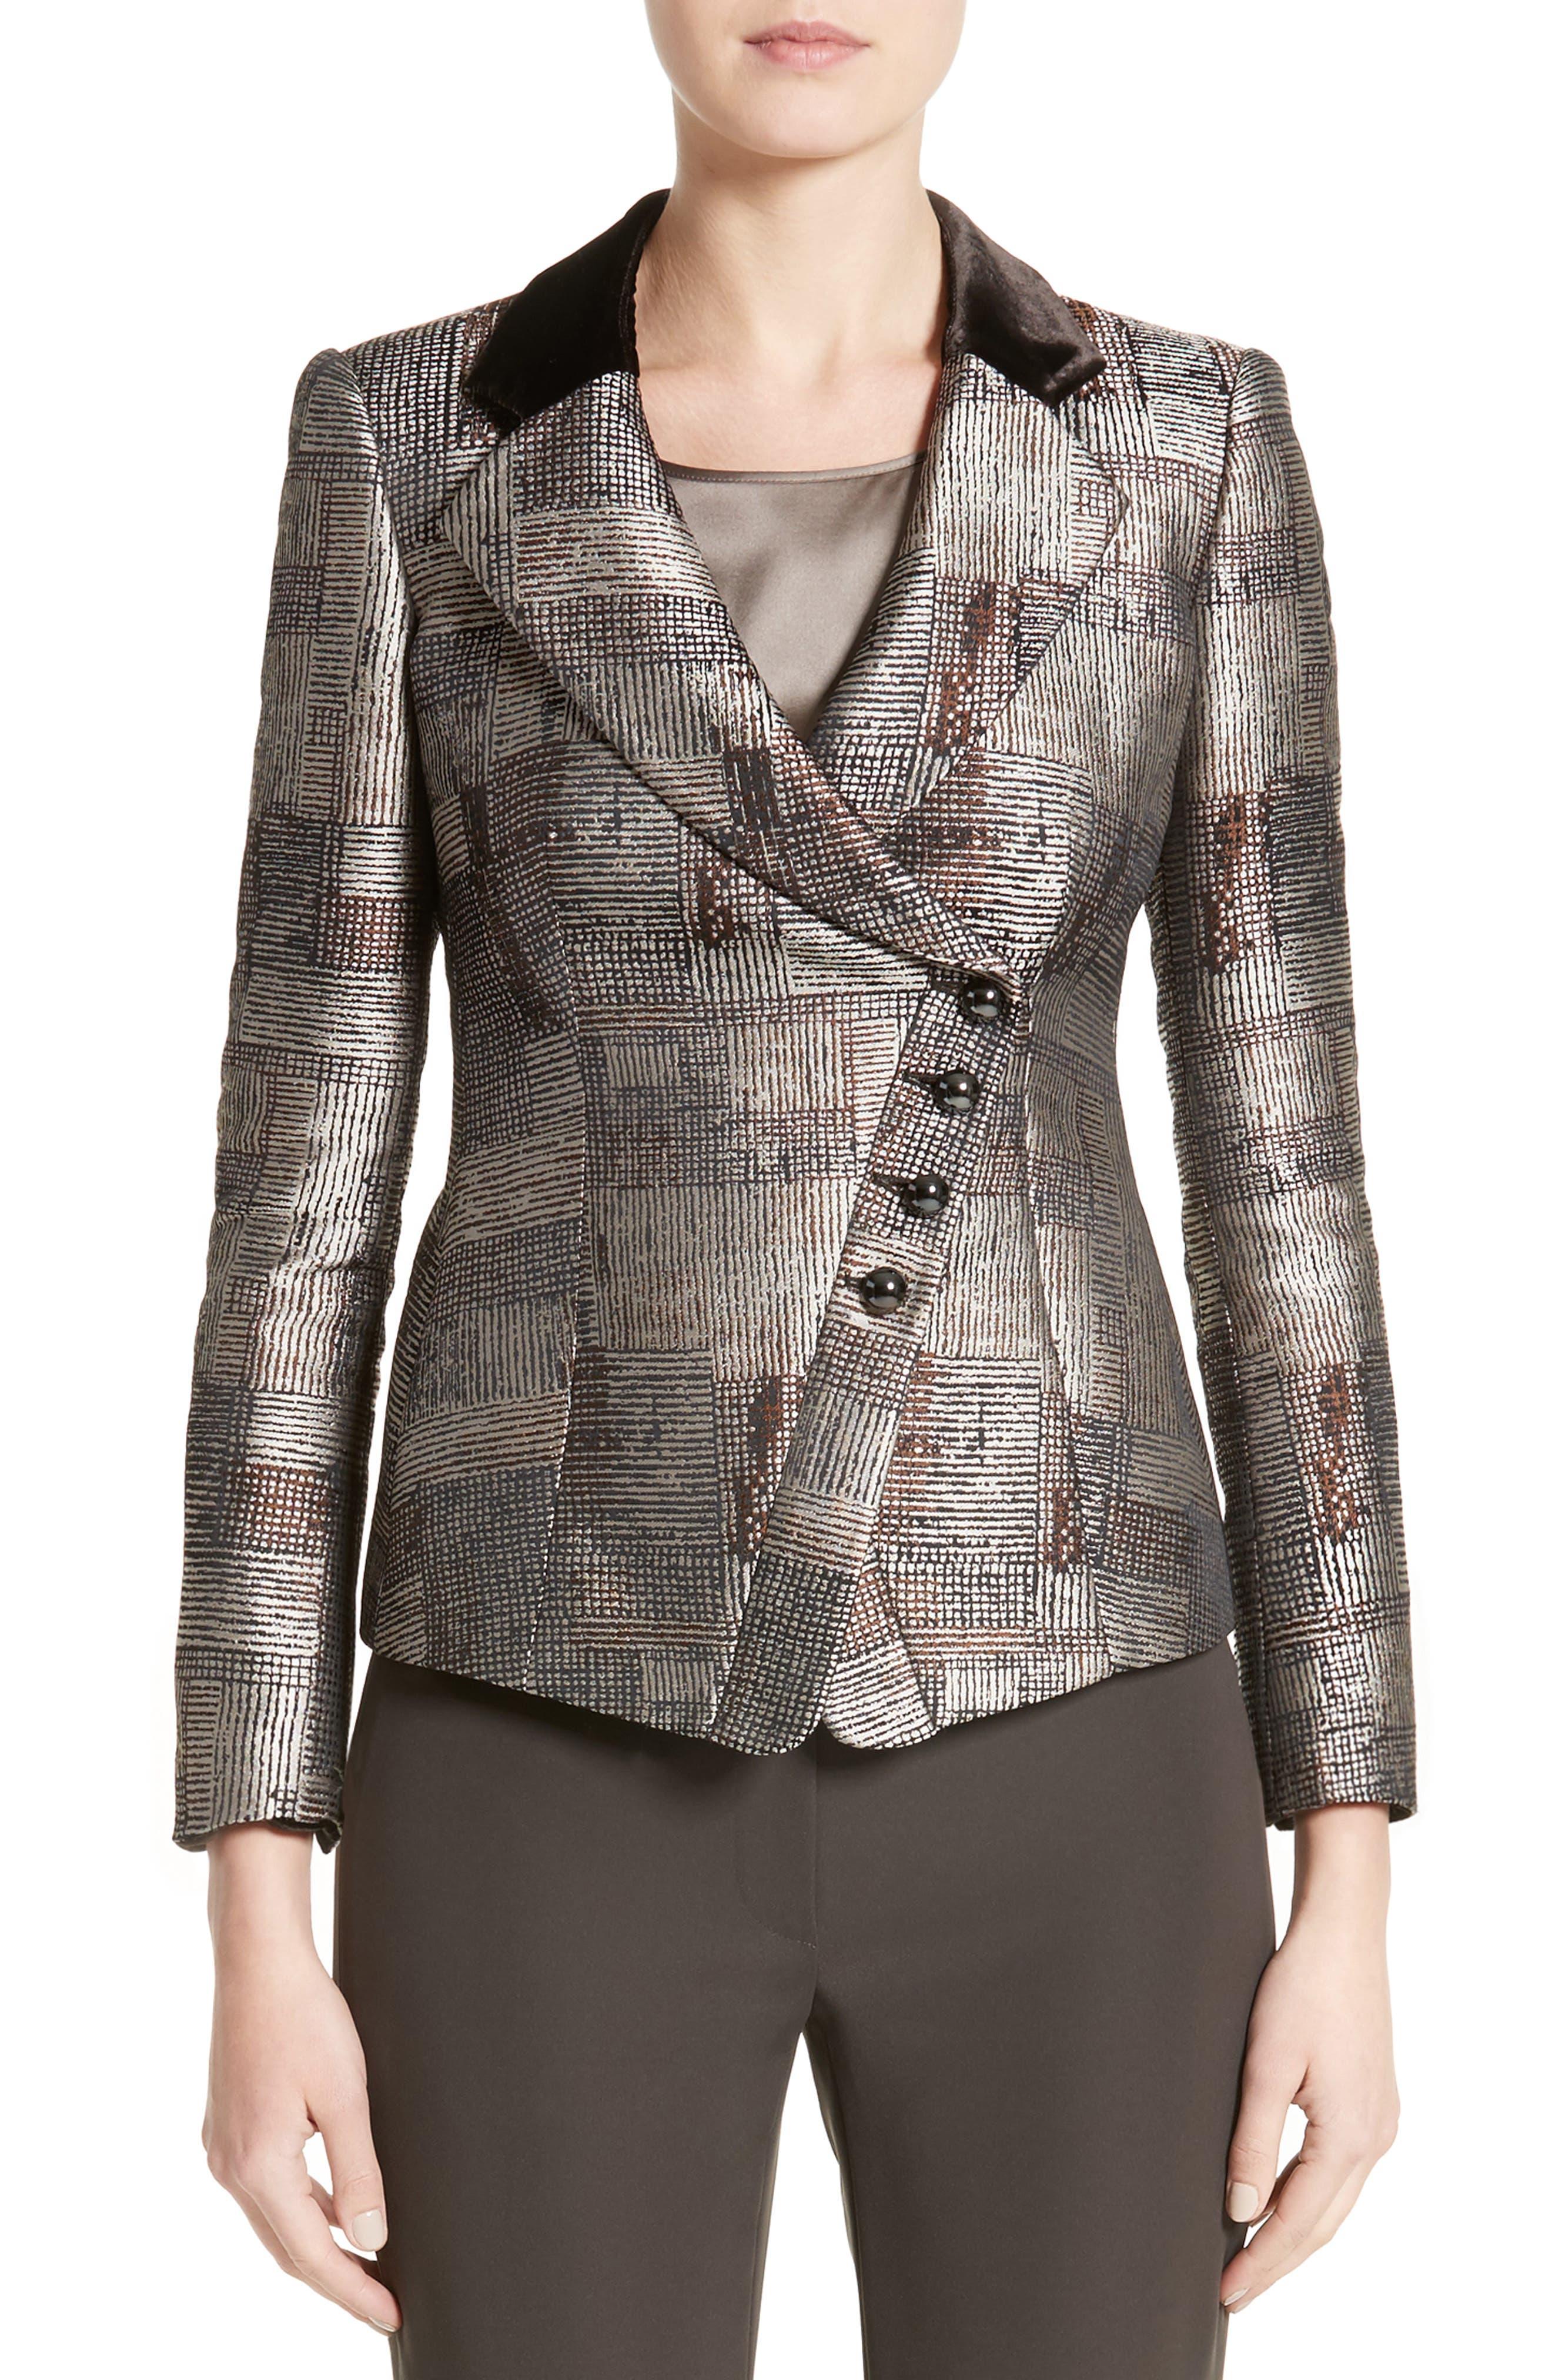 Main Image - Armani Collezioni Panel Jacquard Asymmetrical Jacket